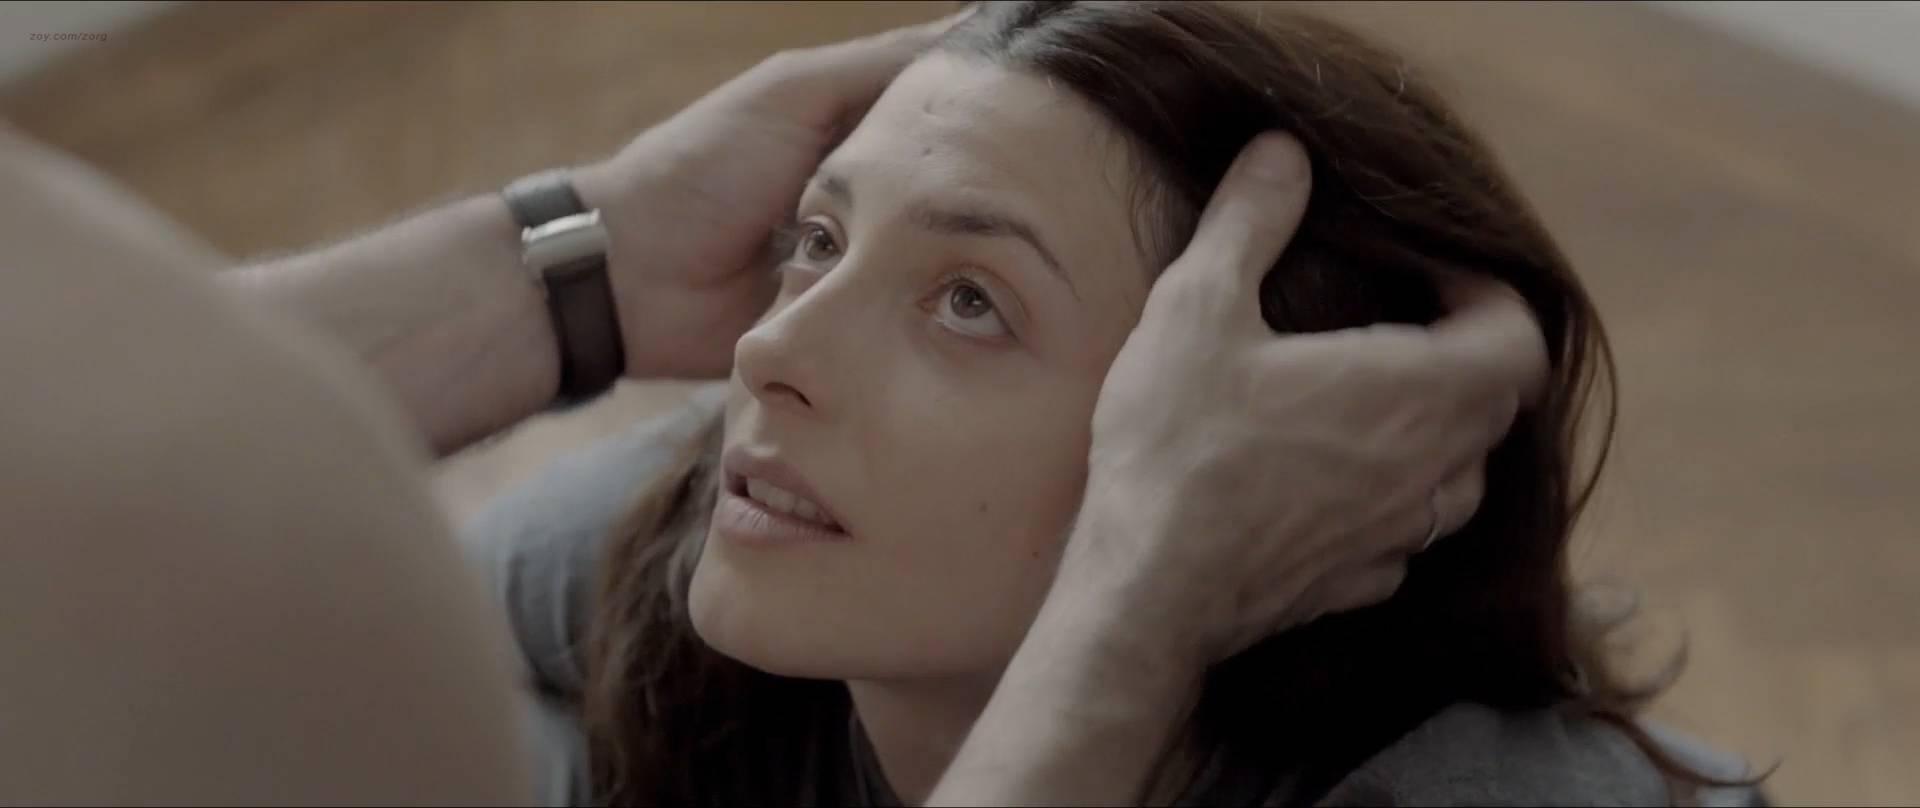 Bárbara Lennie nude full frontal - Magical Girl (ES-2014) hd080p (7)